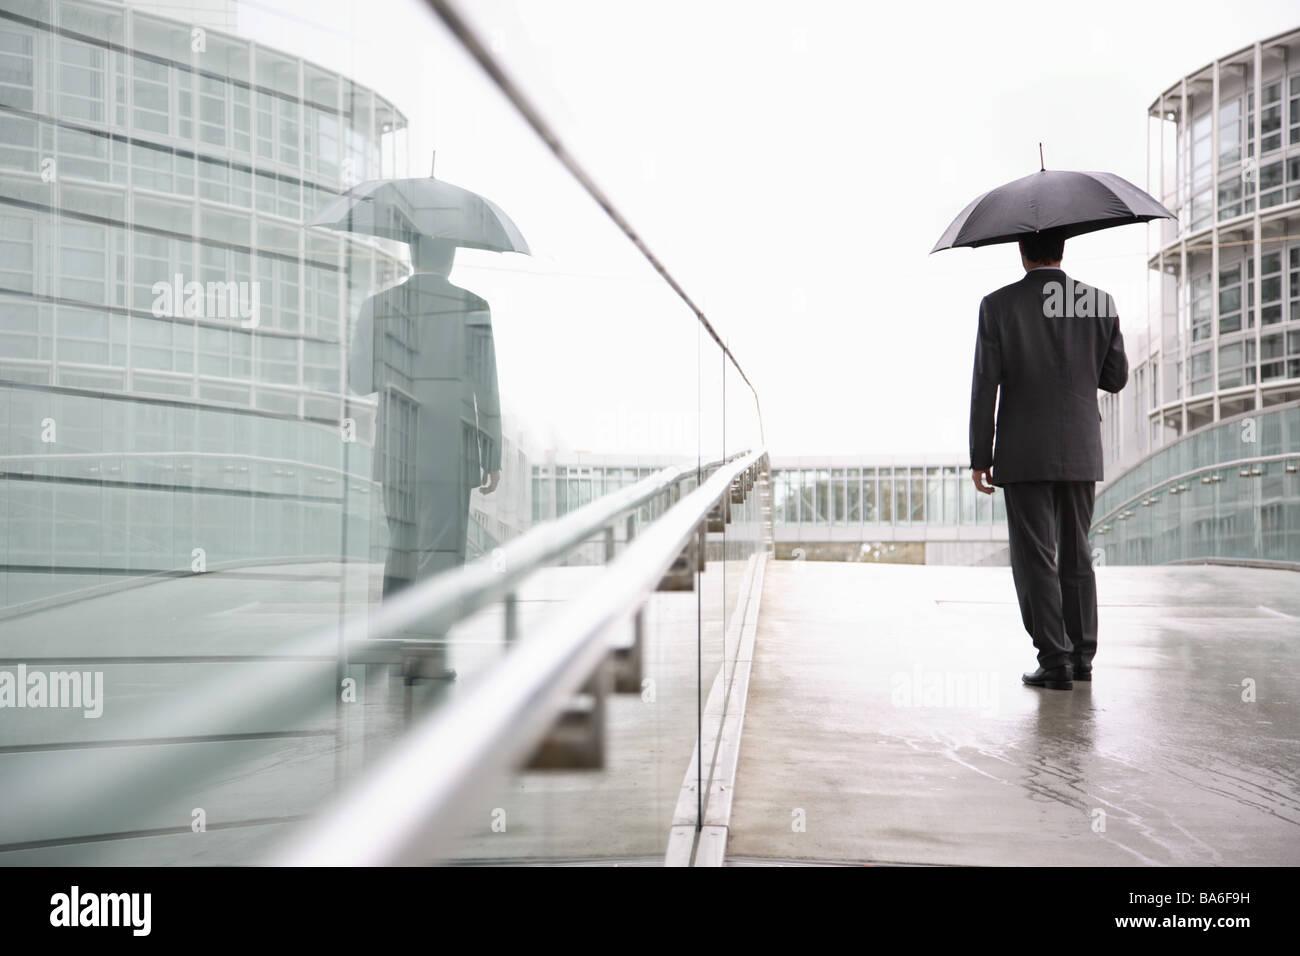 goes businessman umbrella back opinion series people man 30 40 years